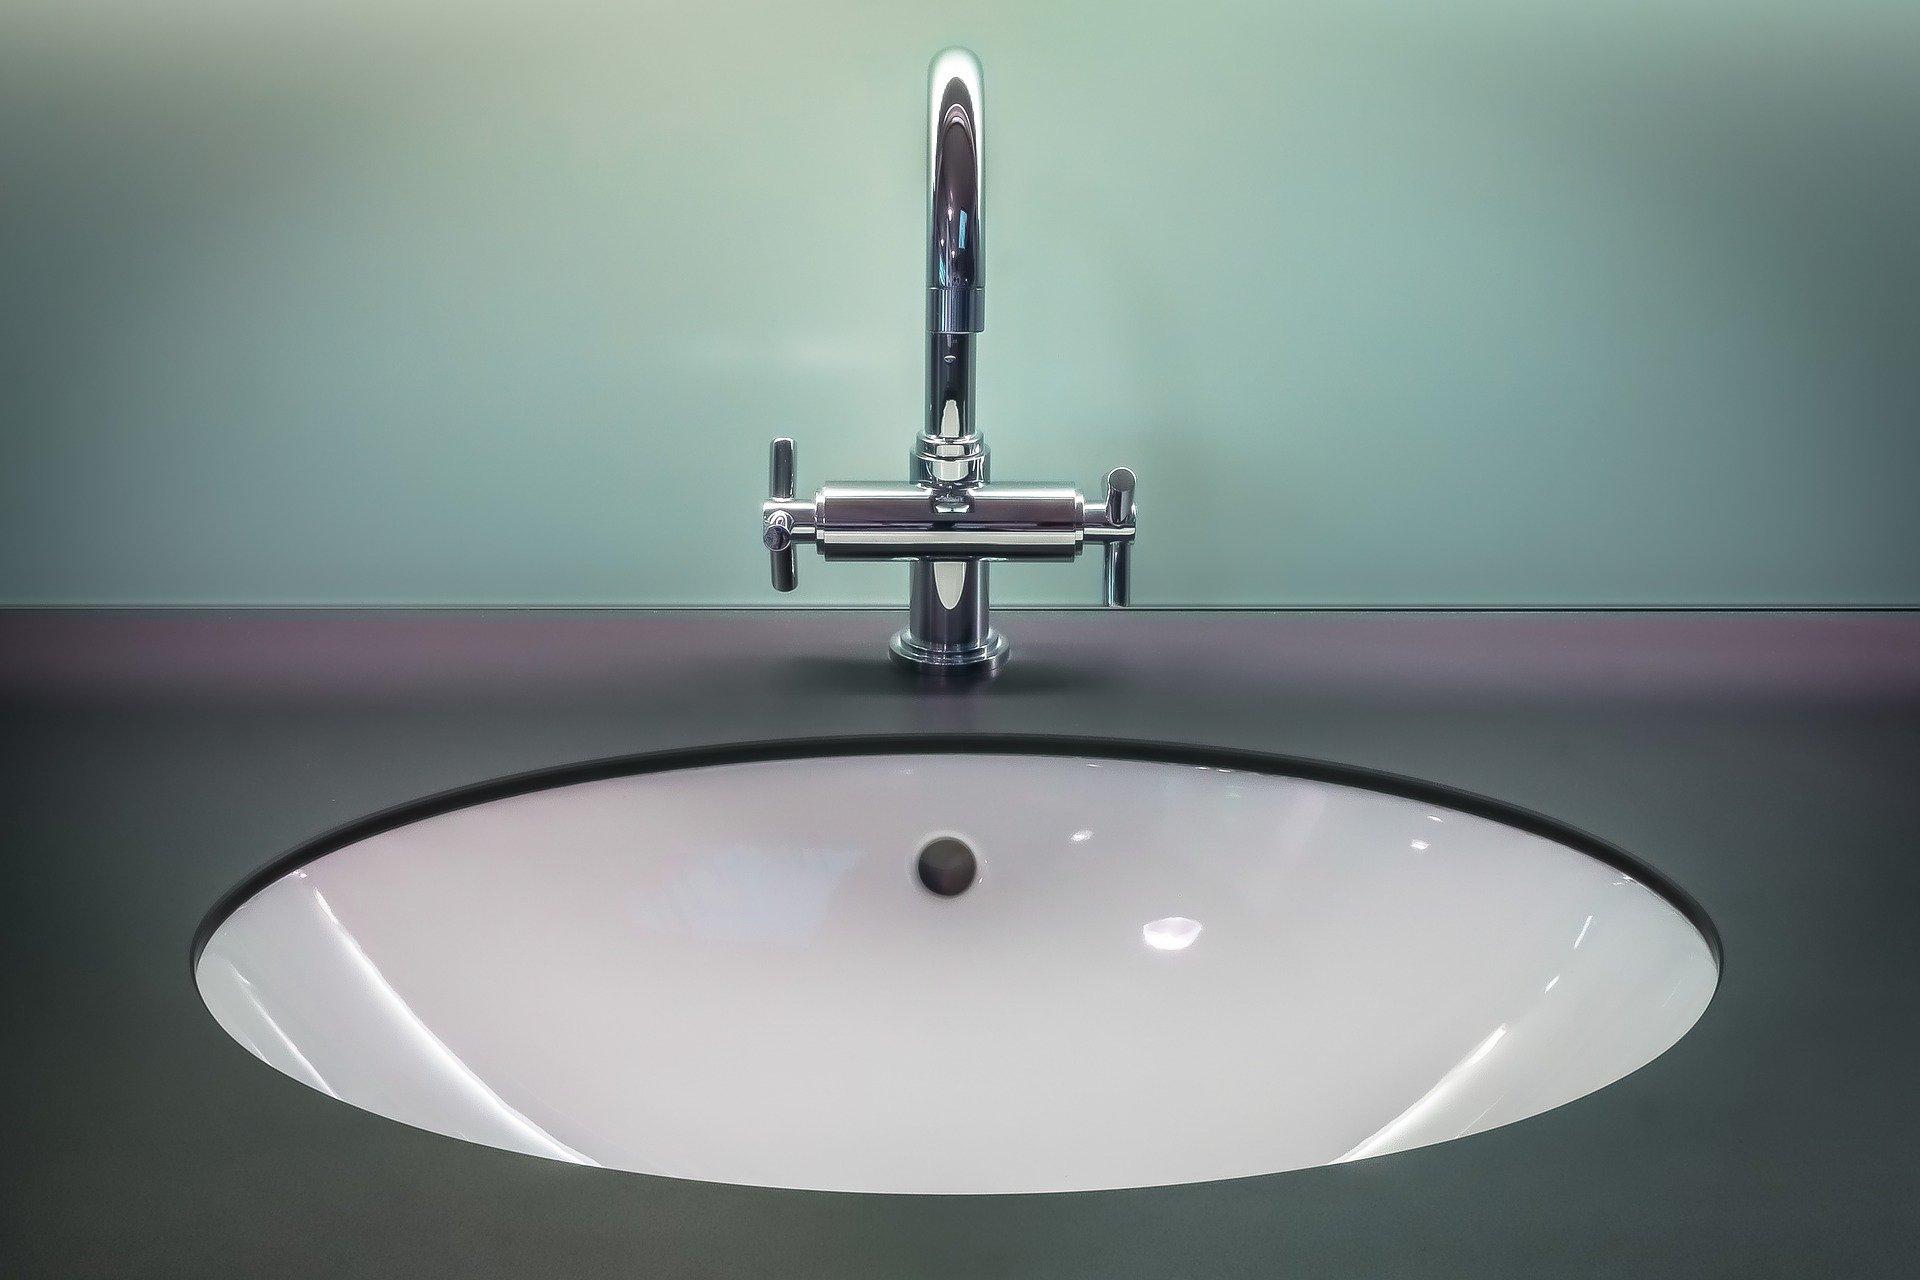 Installation de robinet cuisine, salle de bain, douche